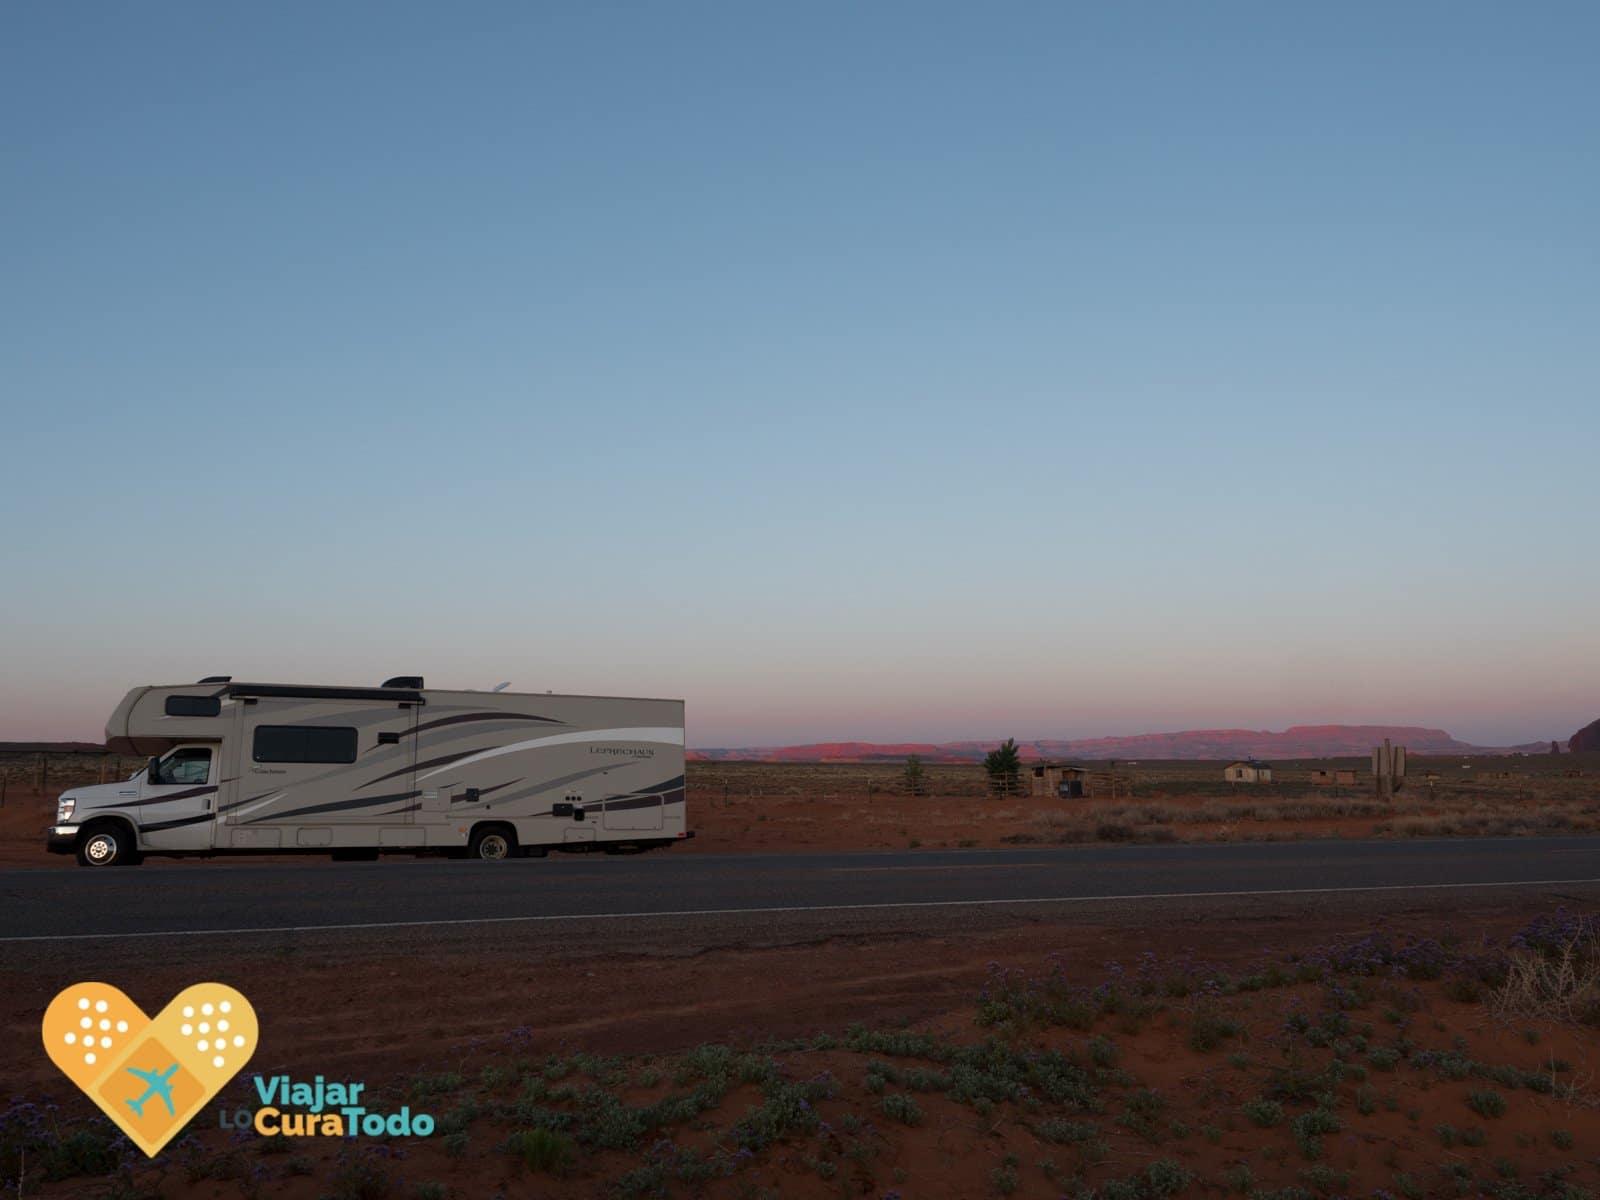 mega caravana en estados unidos